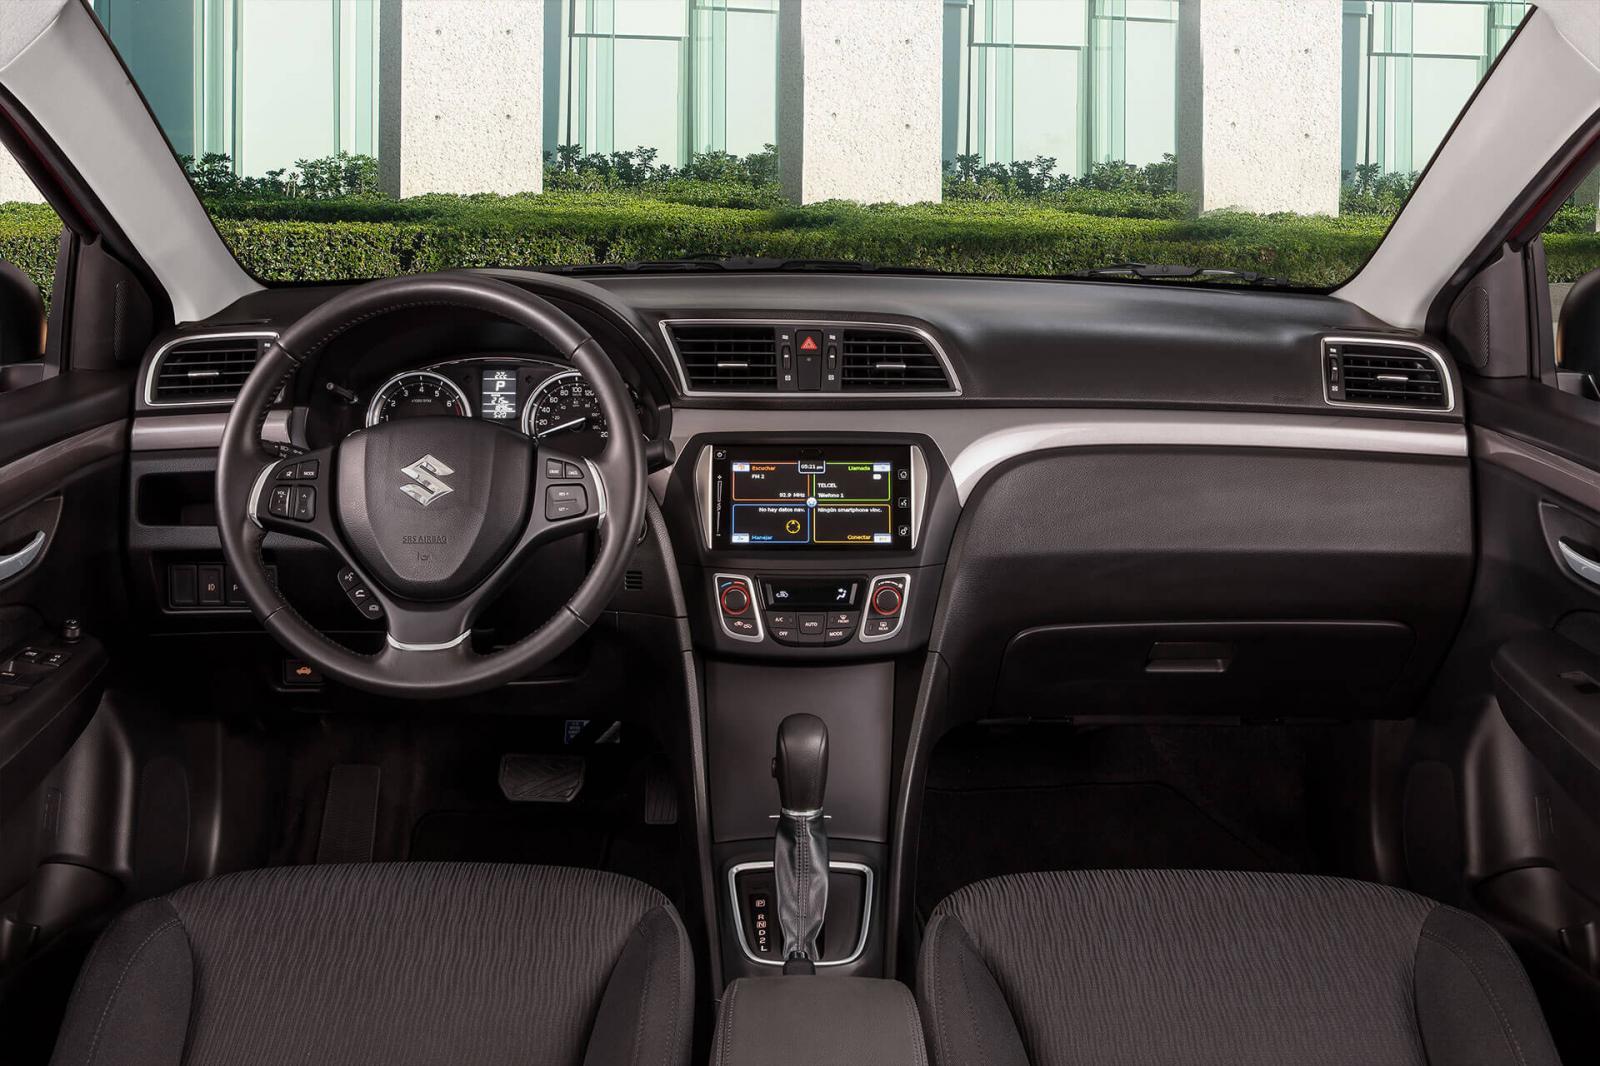 Suzuki Ciaz GLX TA 2021 Nissan Versa Advance TM 2021 comparativa